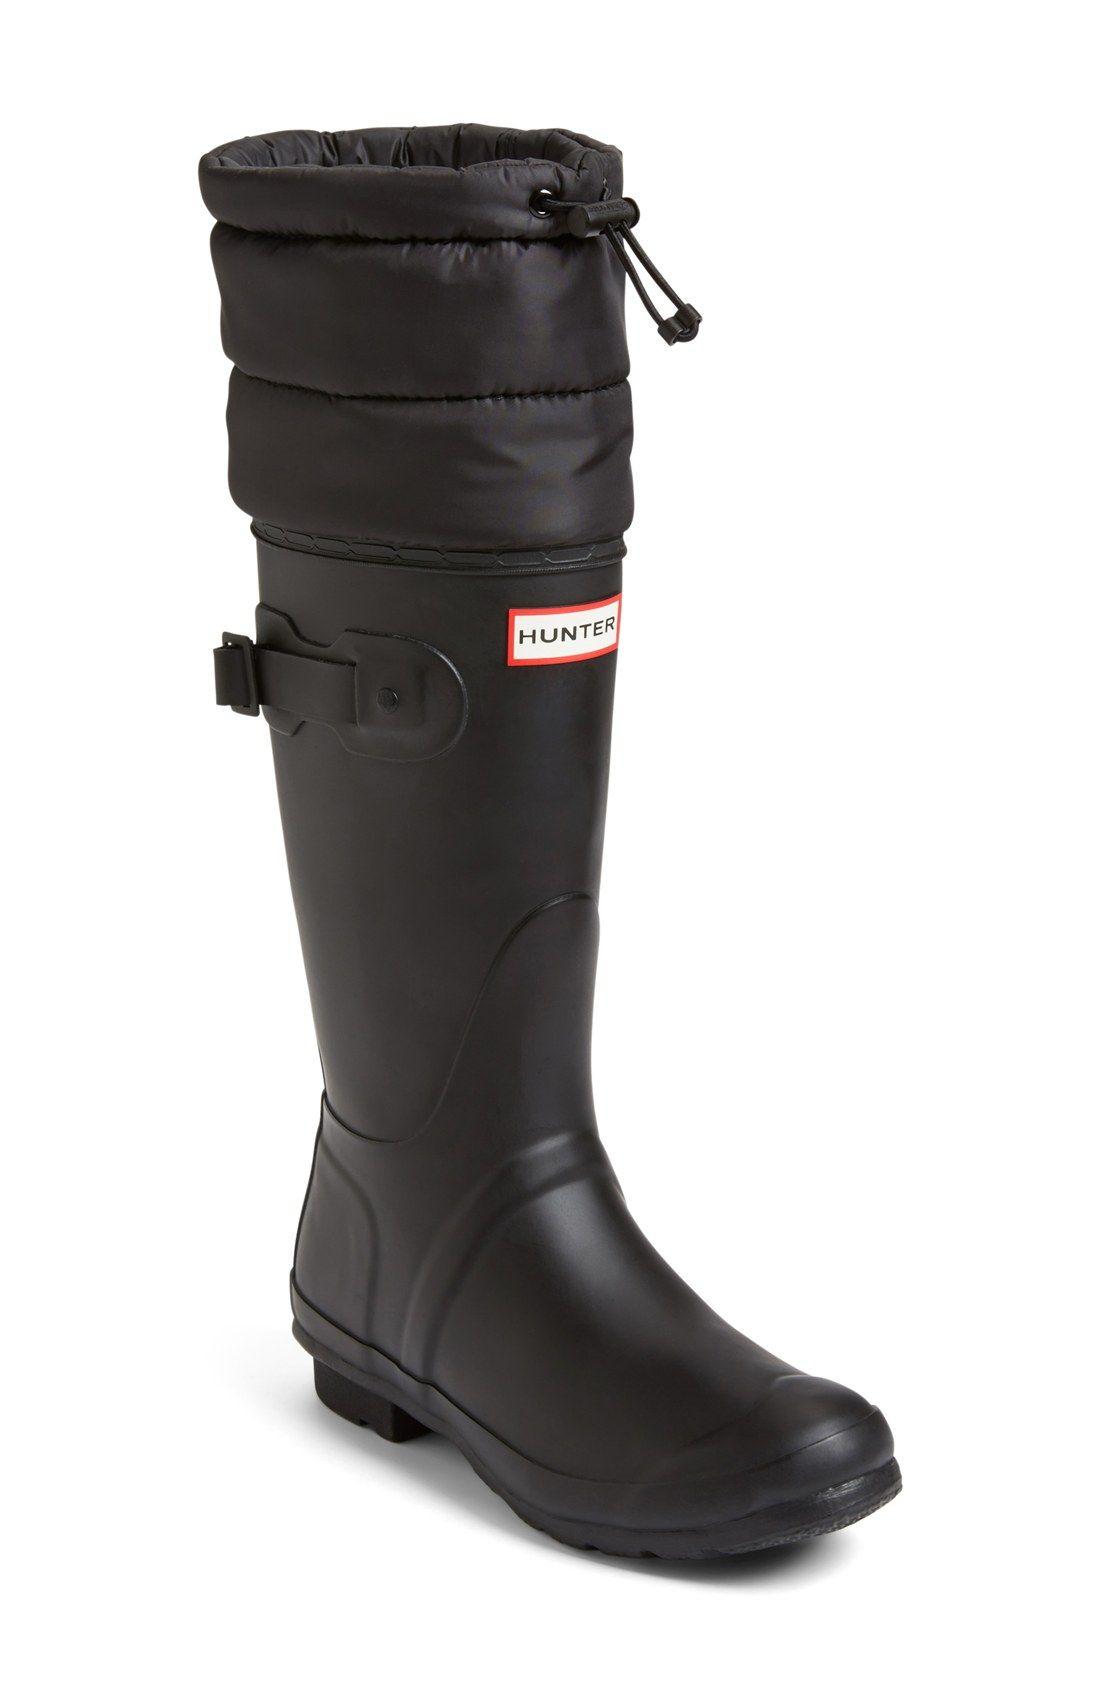 Hunter 'Original - Quilted Cuff' Rain Boot (Women) | Hunter Boots ... : hunter boots quilted - Adamdwight.com